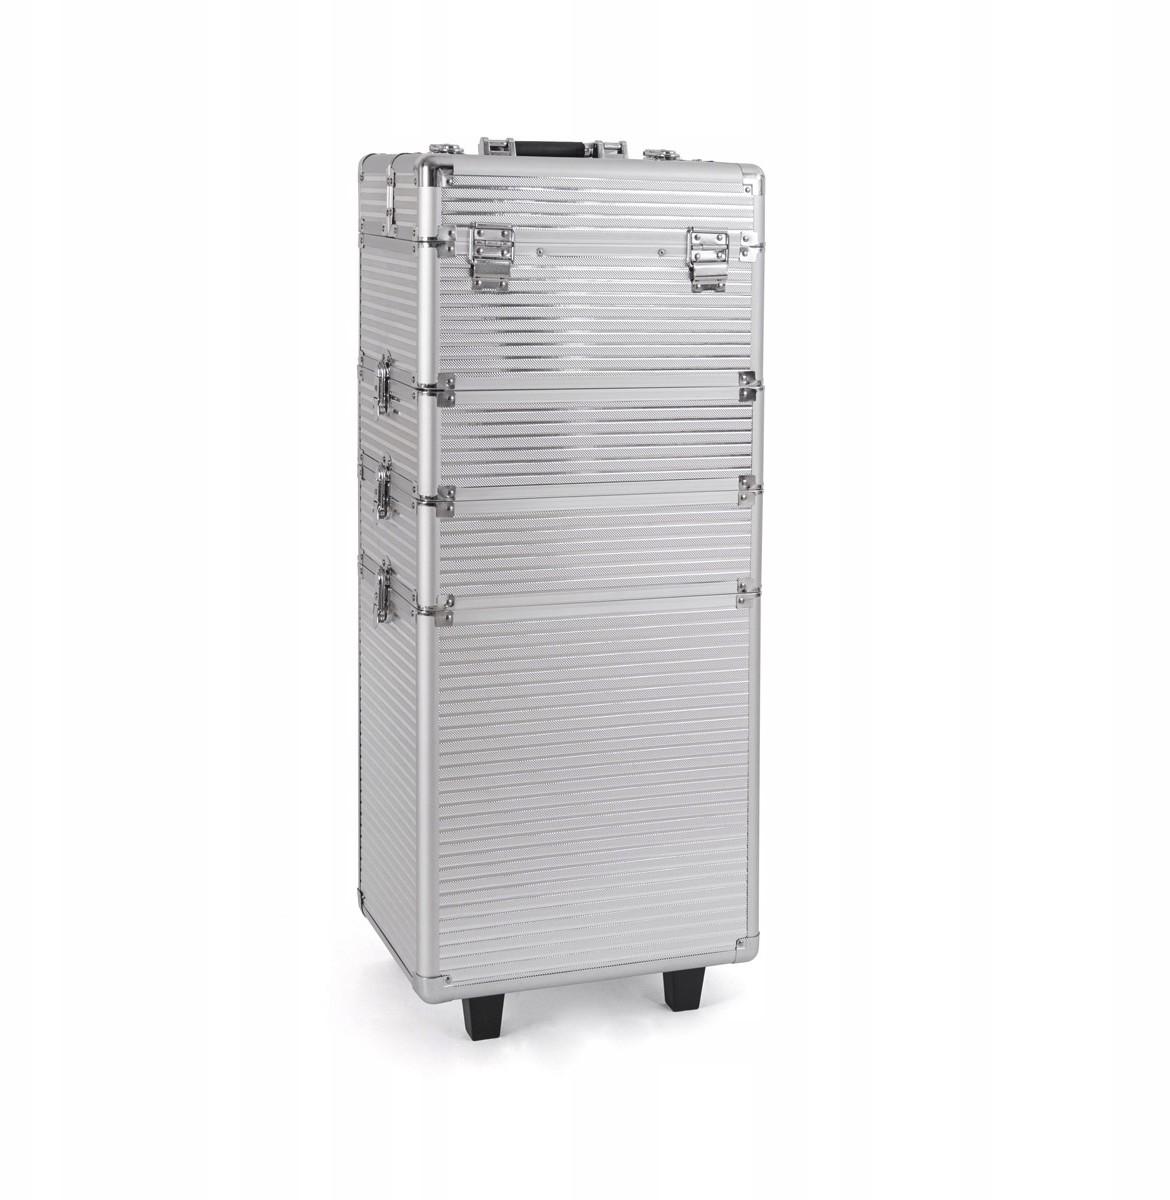 Trolley kufer na kółkach kosmetyczny srebrny paski